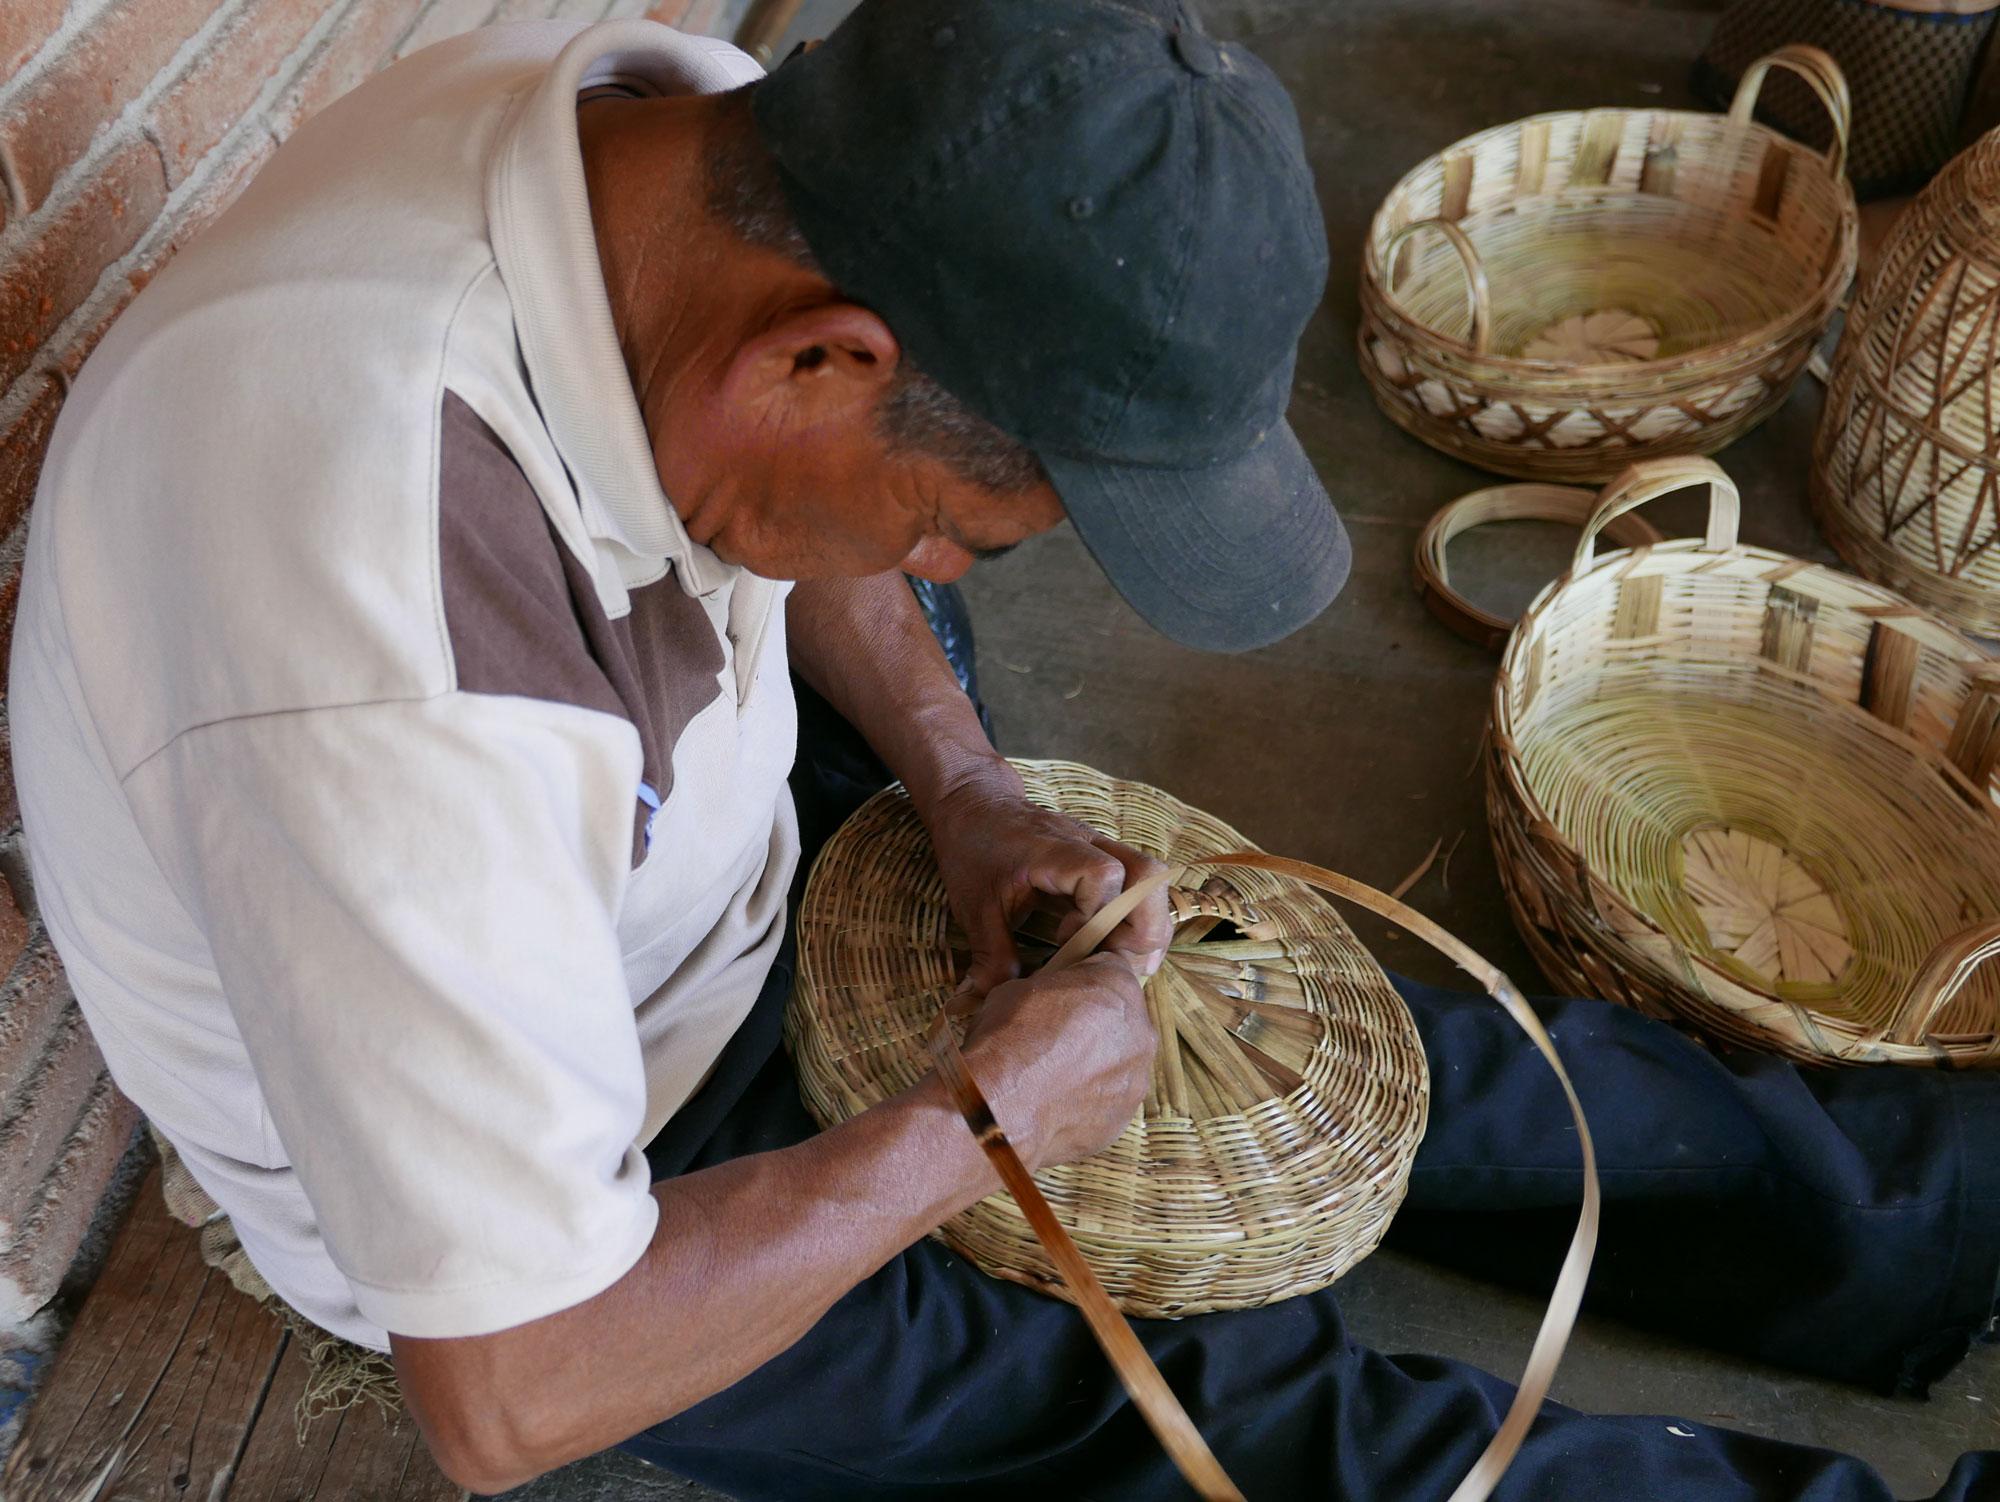 Basket Making using Carrizo Reeds in Oaxaca Mexico - www.nidocollective.com/carrizoweaving #carrizo #canastascarrizo #basketweaving